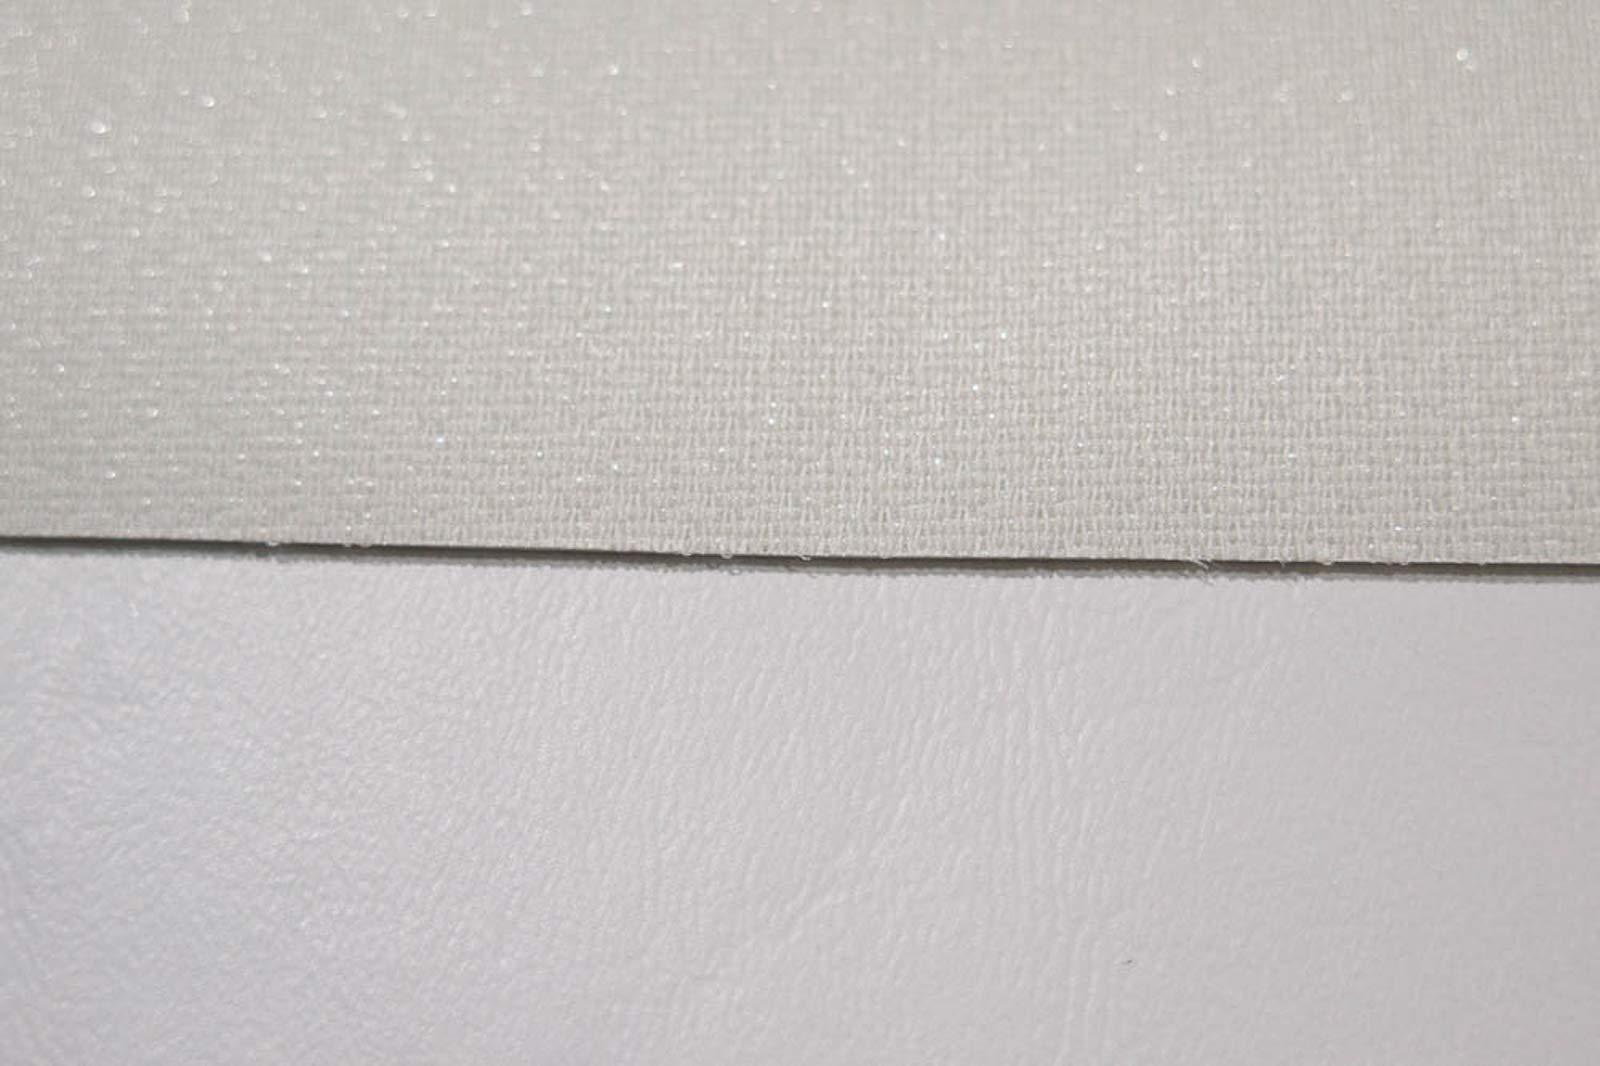 Bry-Tech Marine1 Marine Vinyl Upholstery Fabric Bright White 54'' Wide by 10 Yards Boat Auto by Bry-Tech Marine1 (Image #7)